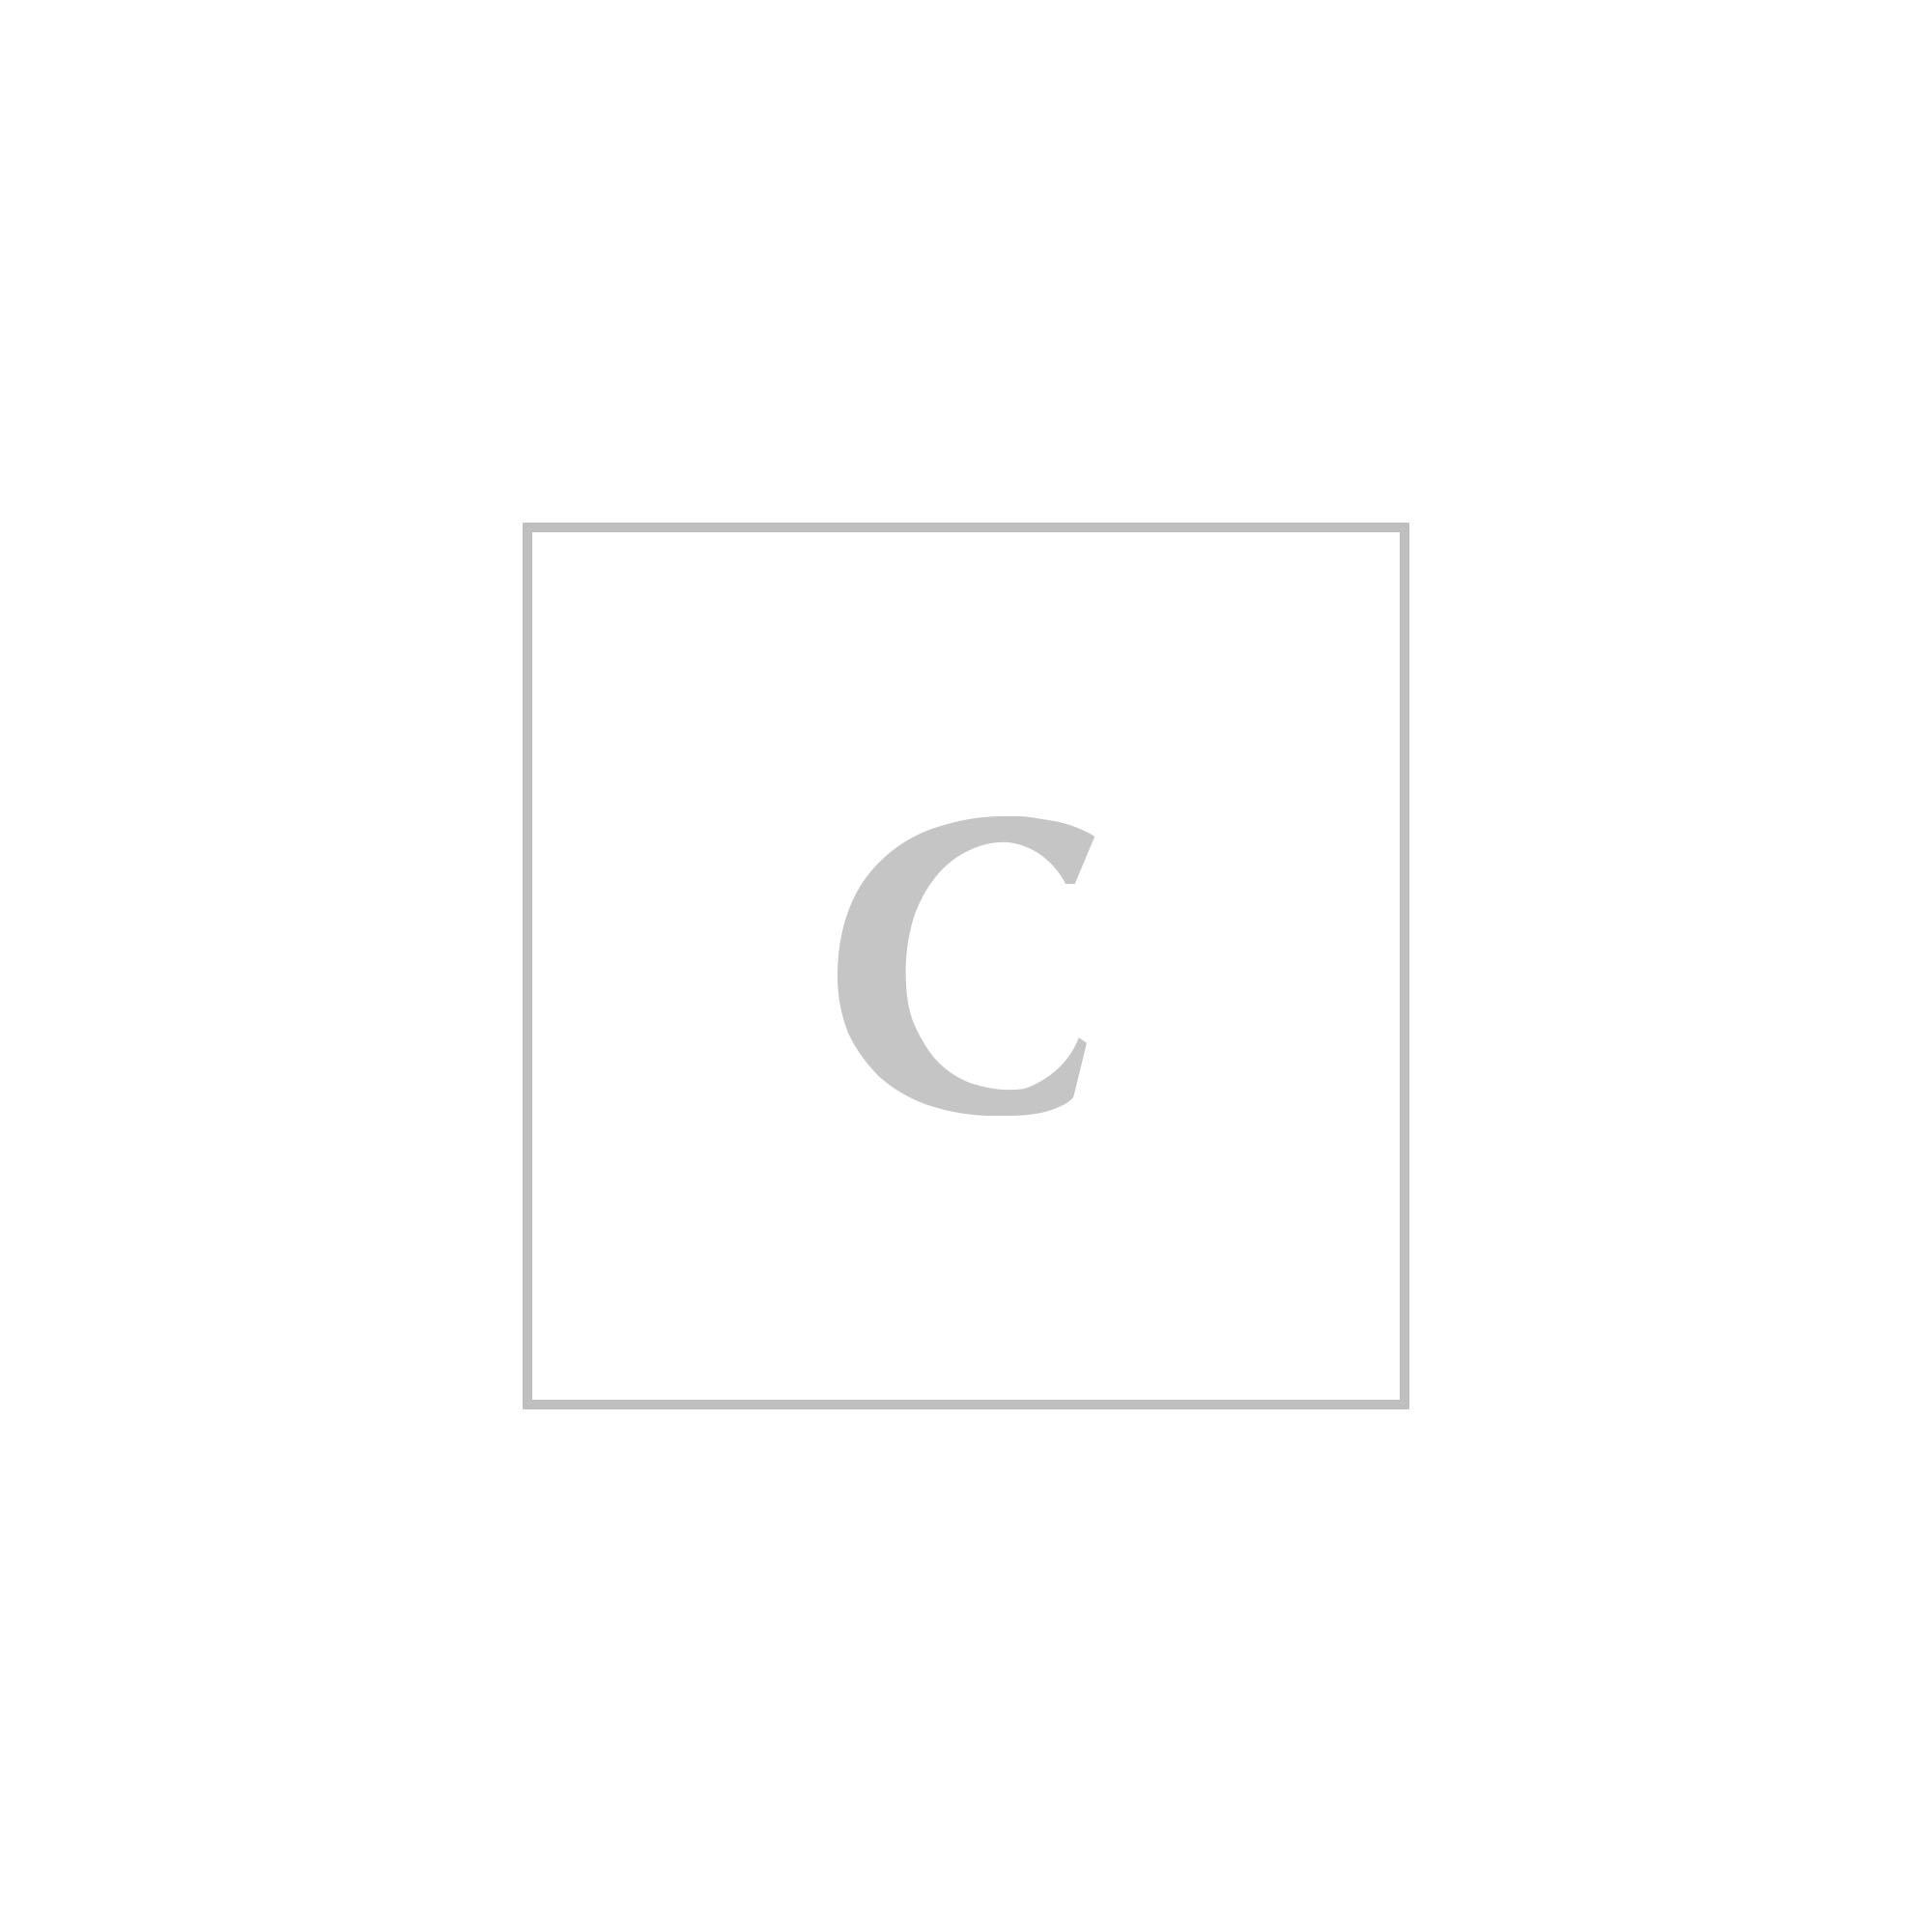 Dolce & gabbana decolletÉ nappa+chantilly